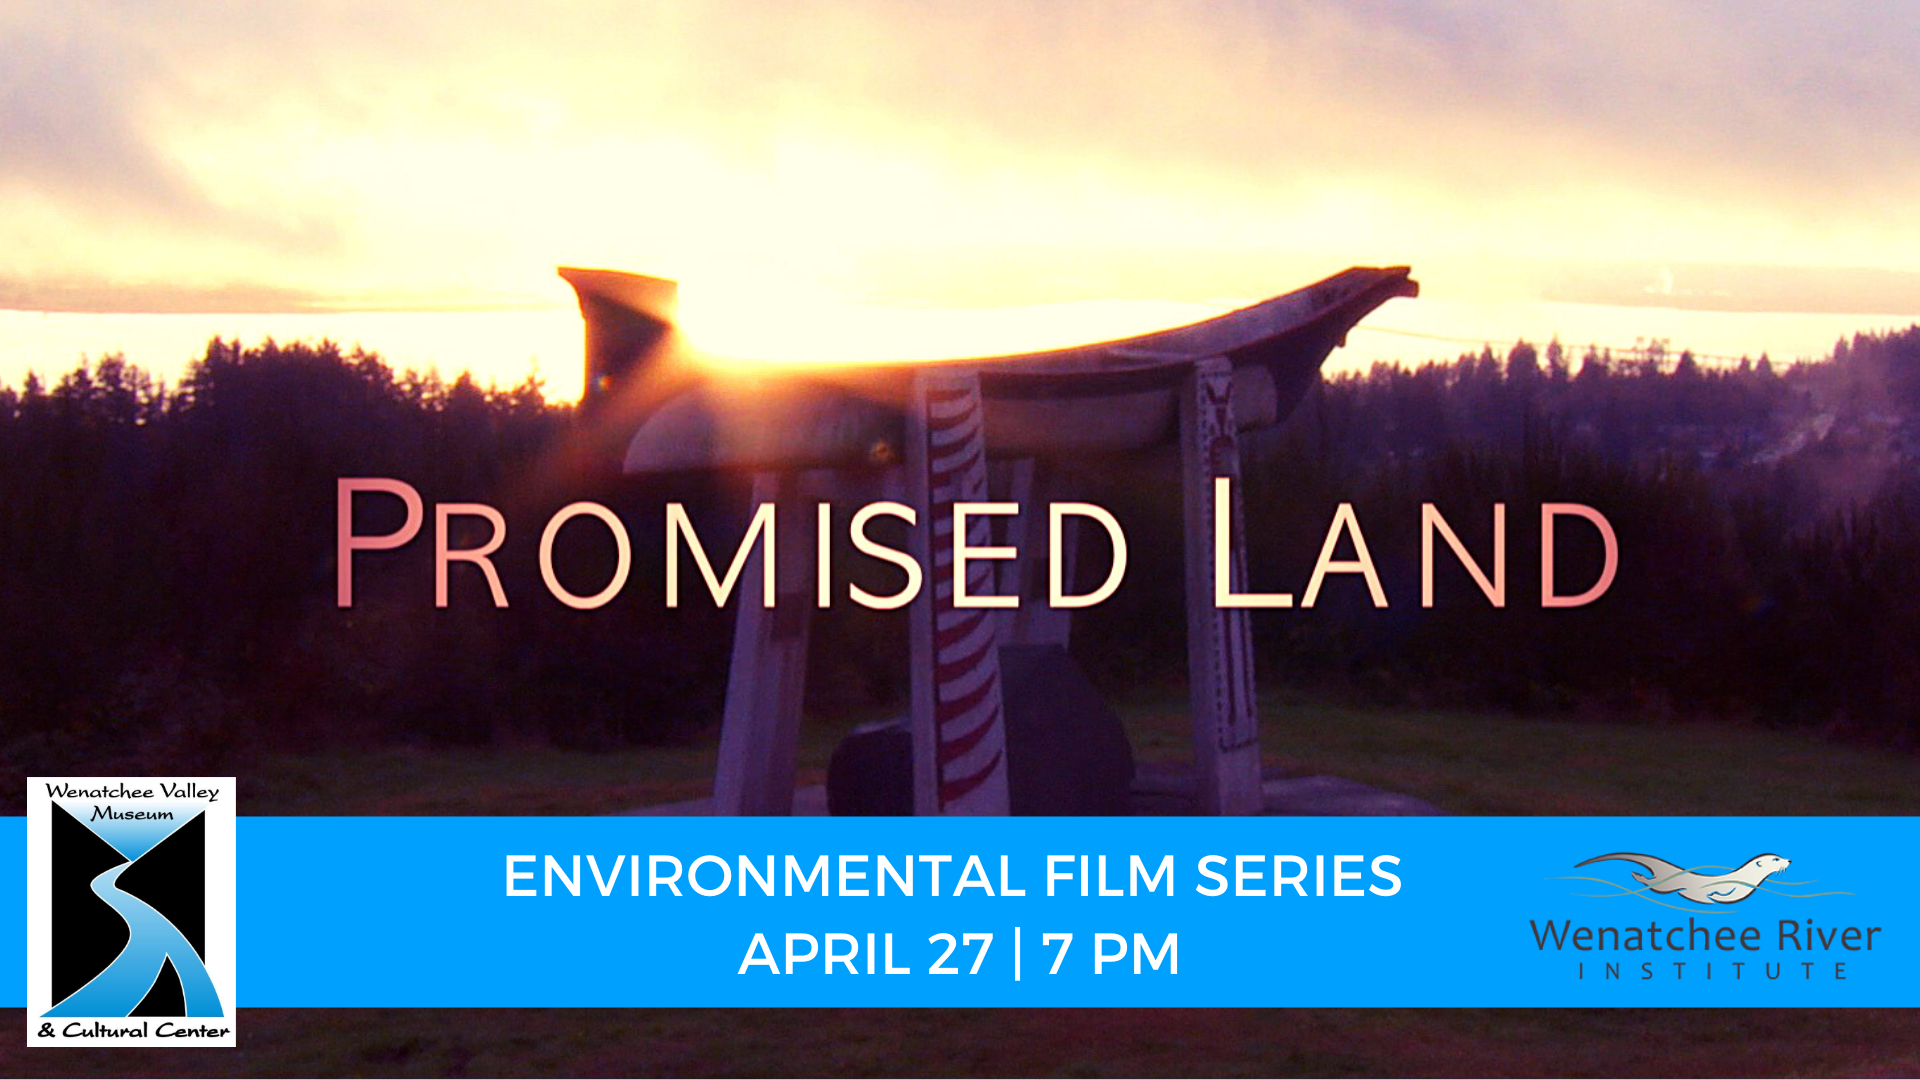 Wenatchee Valley Museum Environmental Film Series - Promised Land